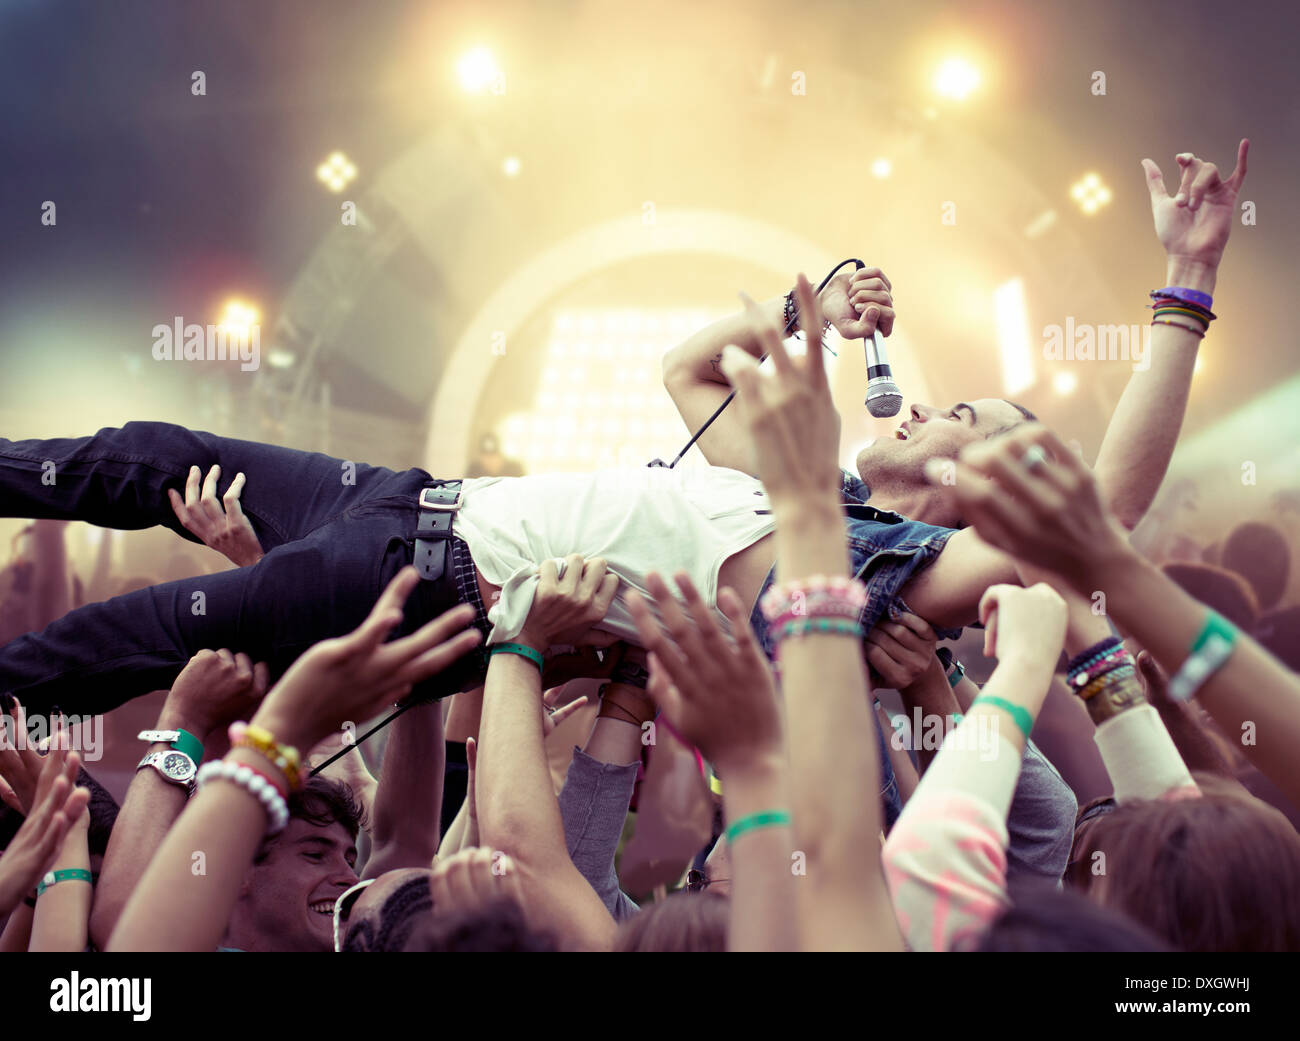 Performer Crowdsurfing beim Musikfestival Stockfoto